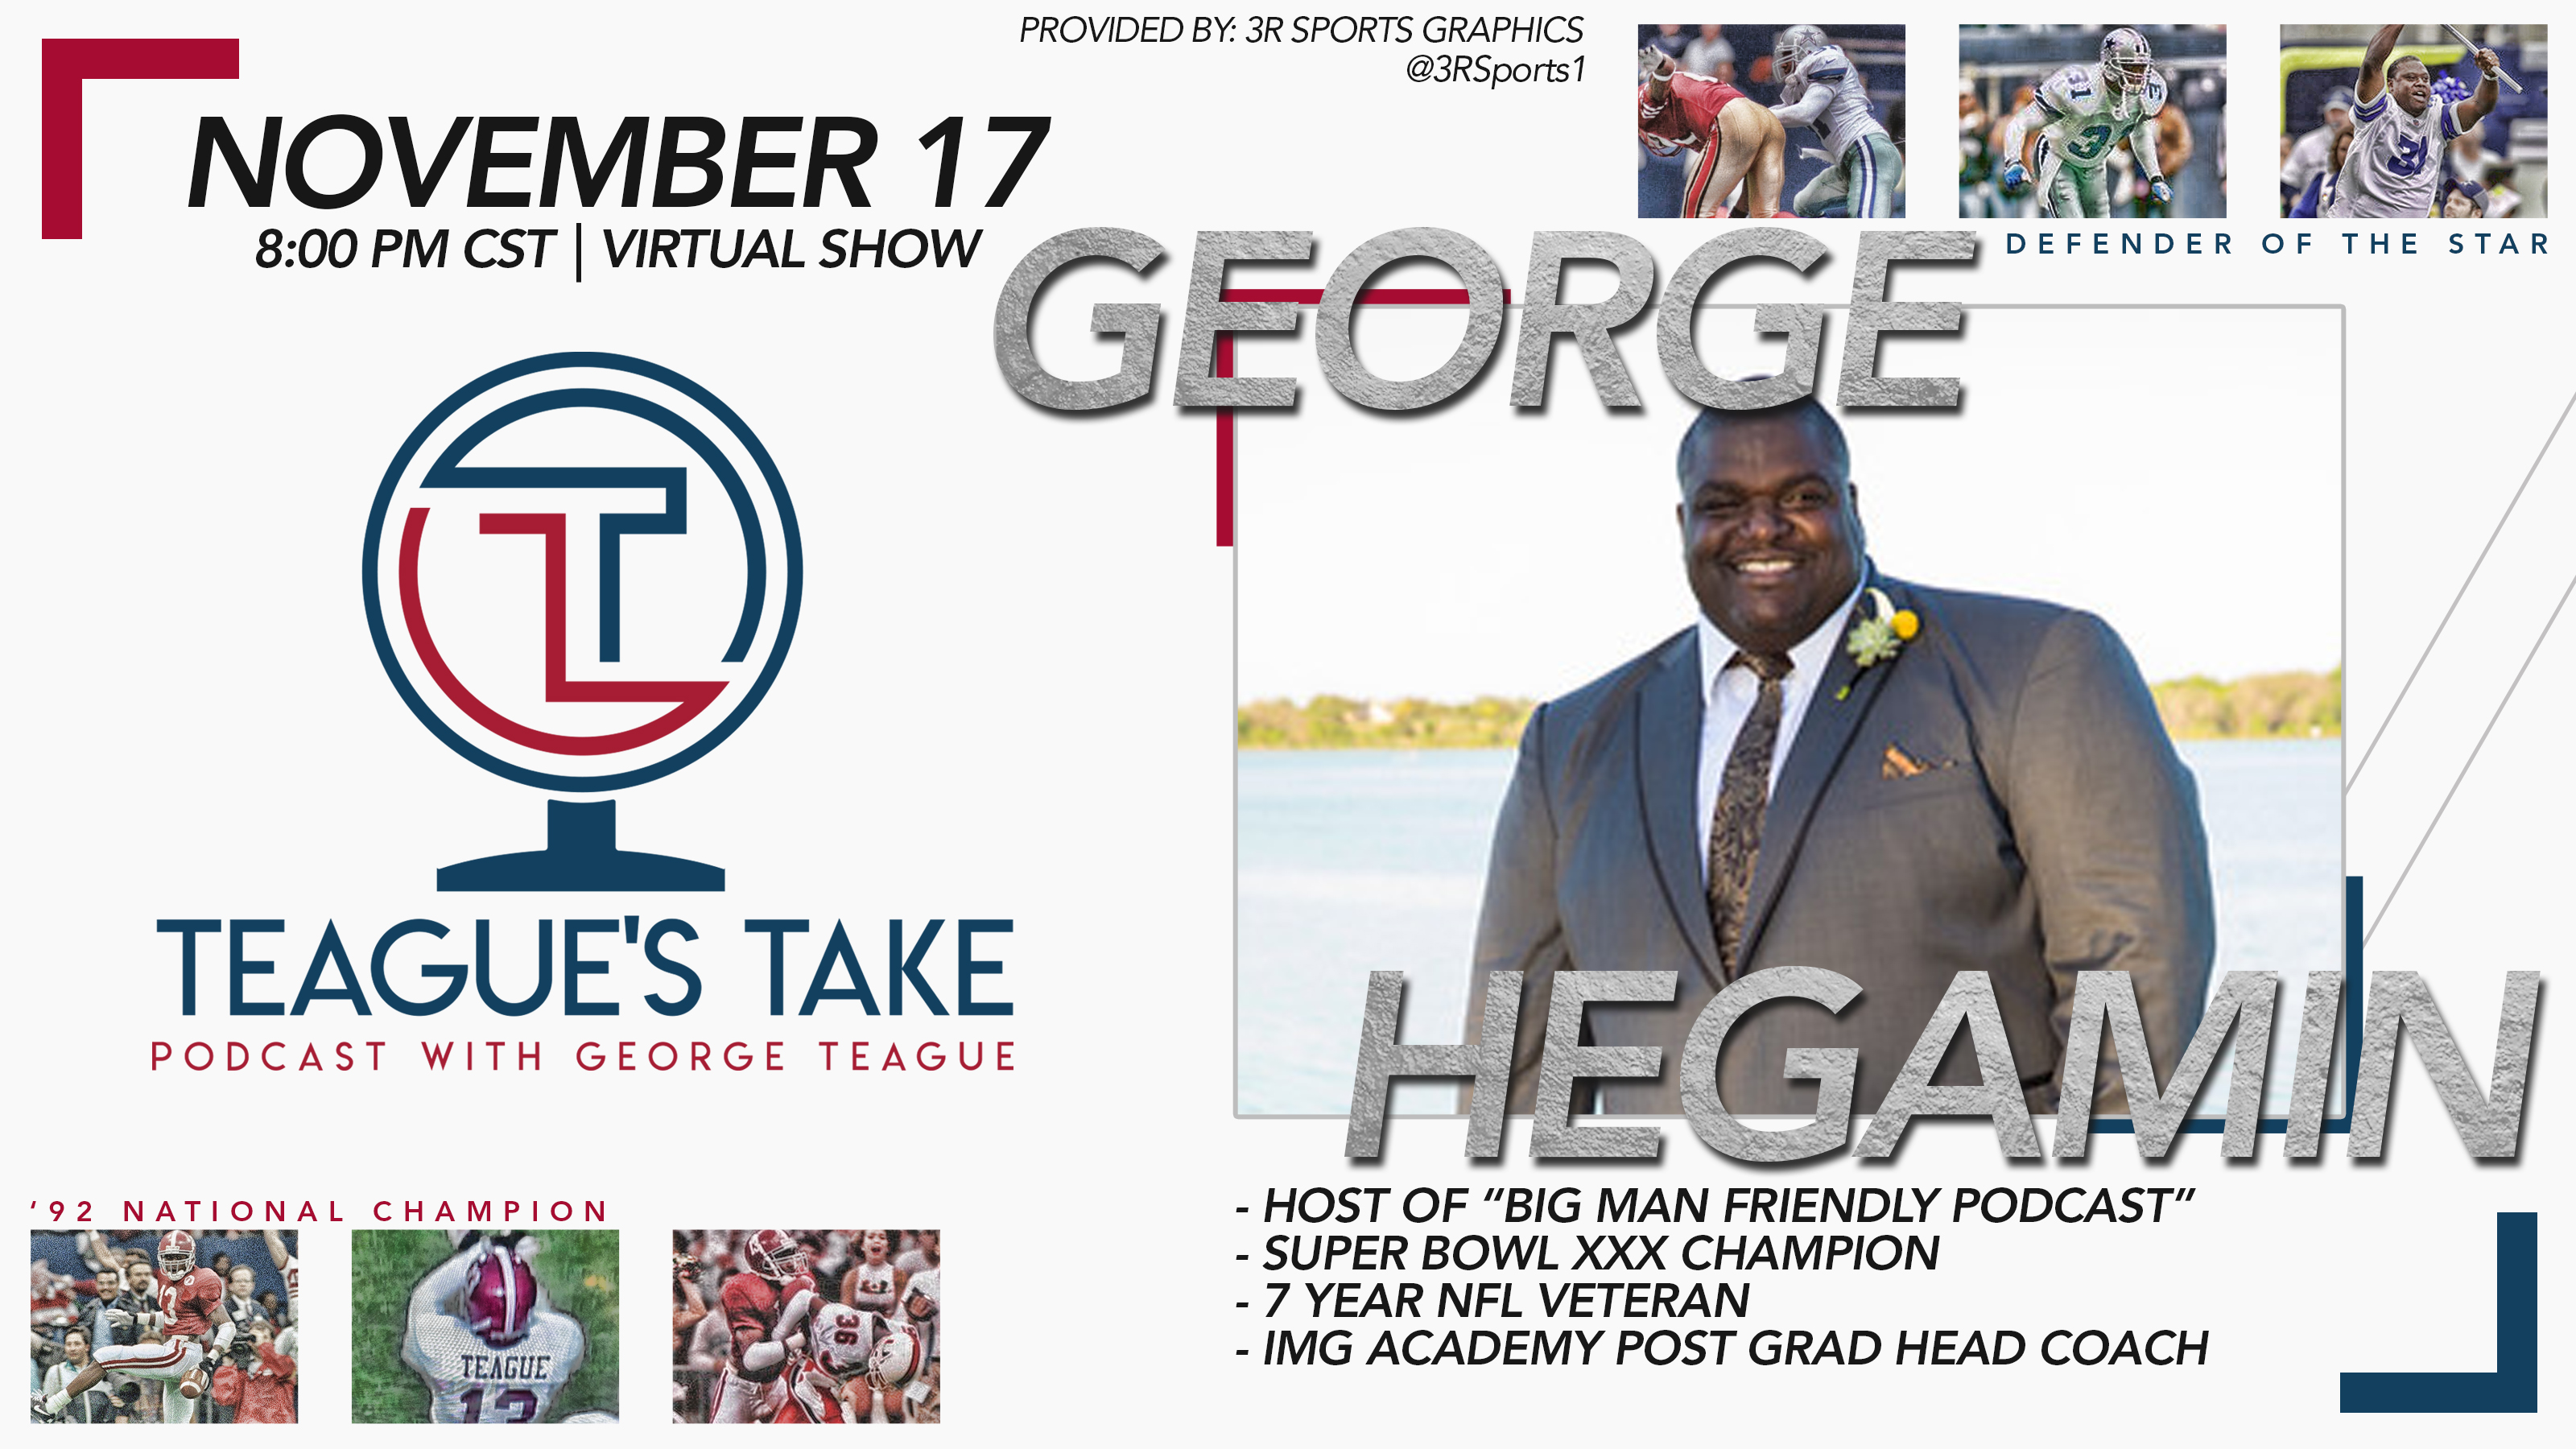 Teague's Take with George Teague